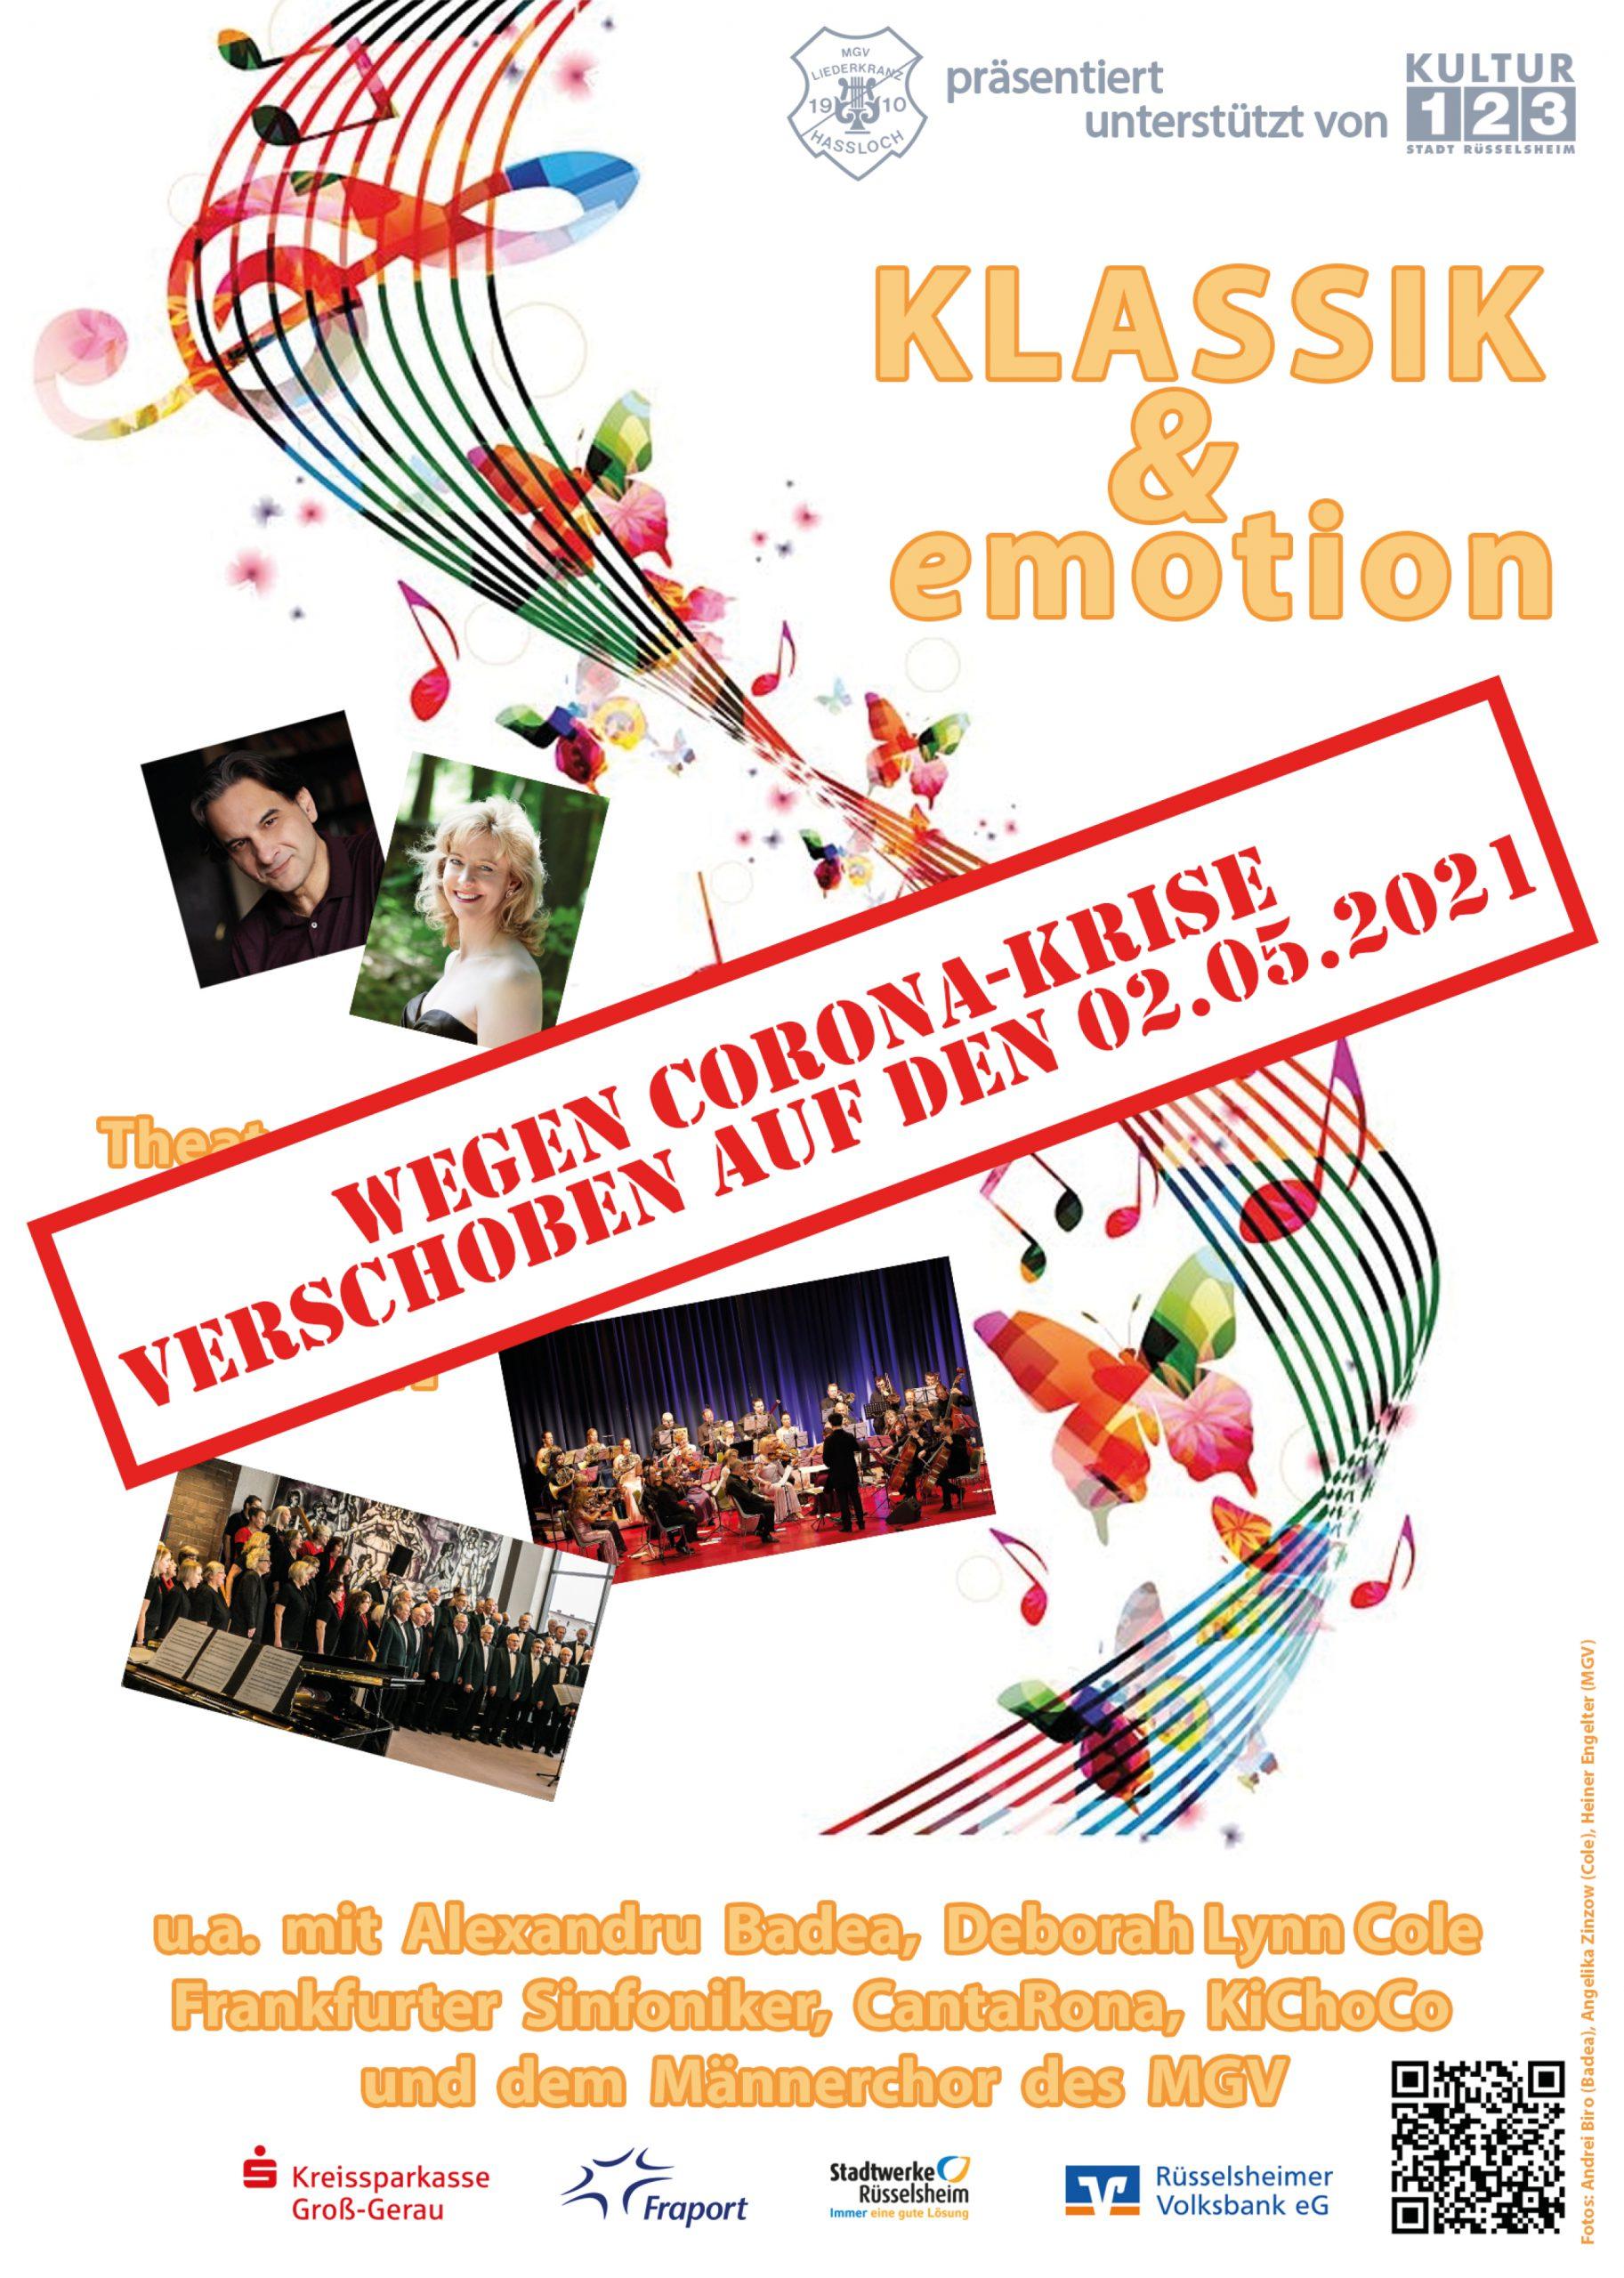 Konzertplakat Klassik & emotion